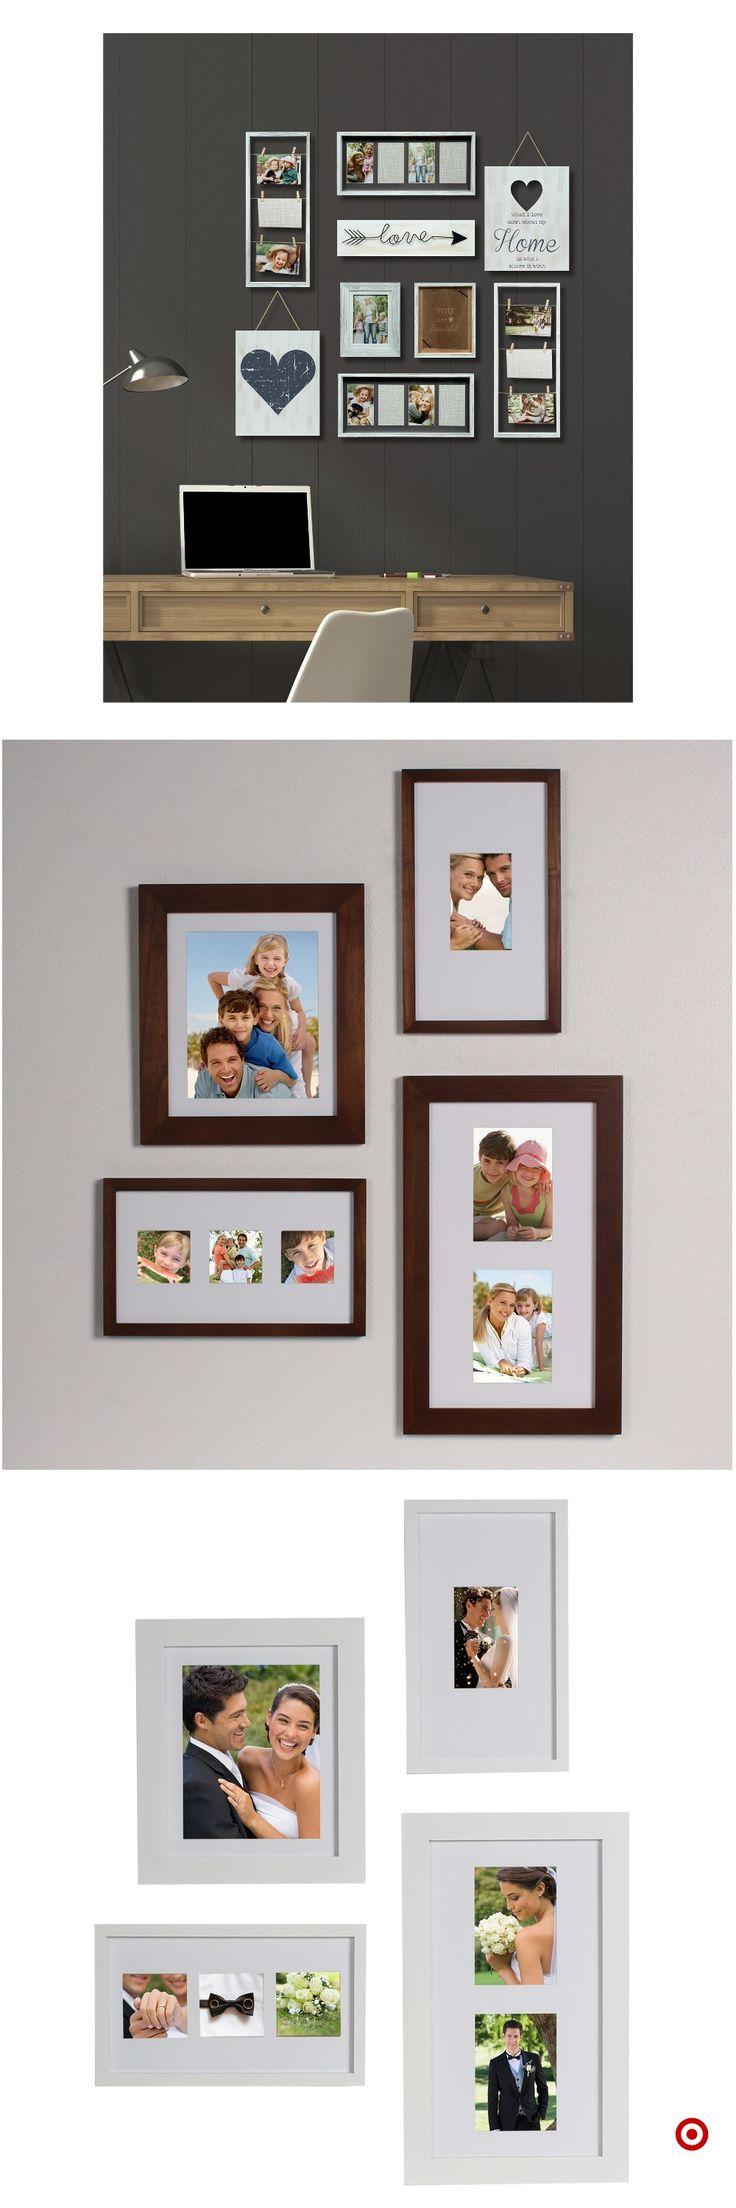 best printables images on pinterest free printable free